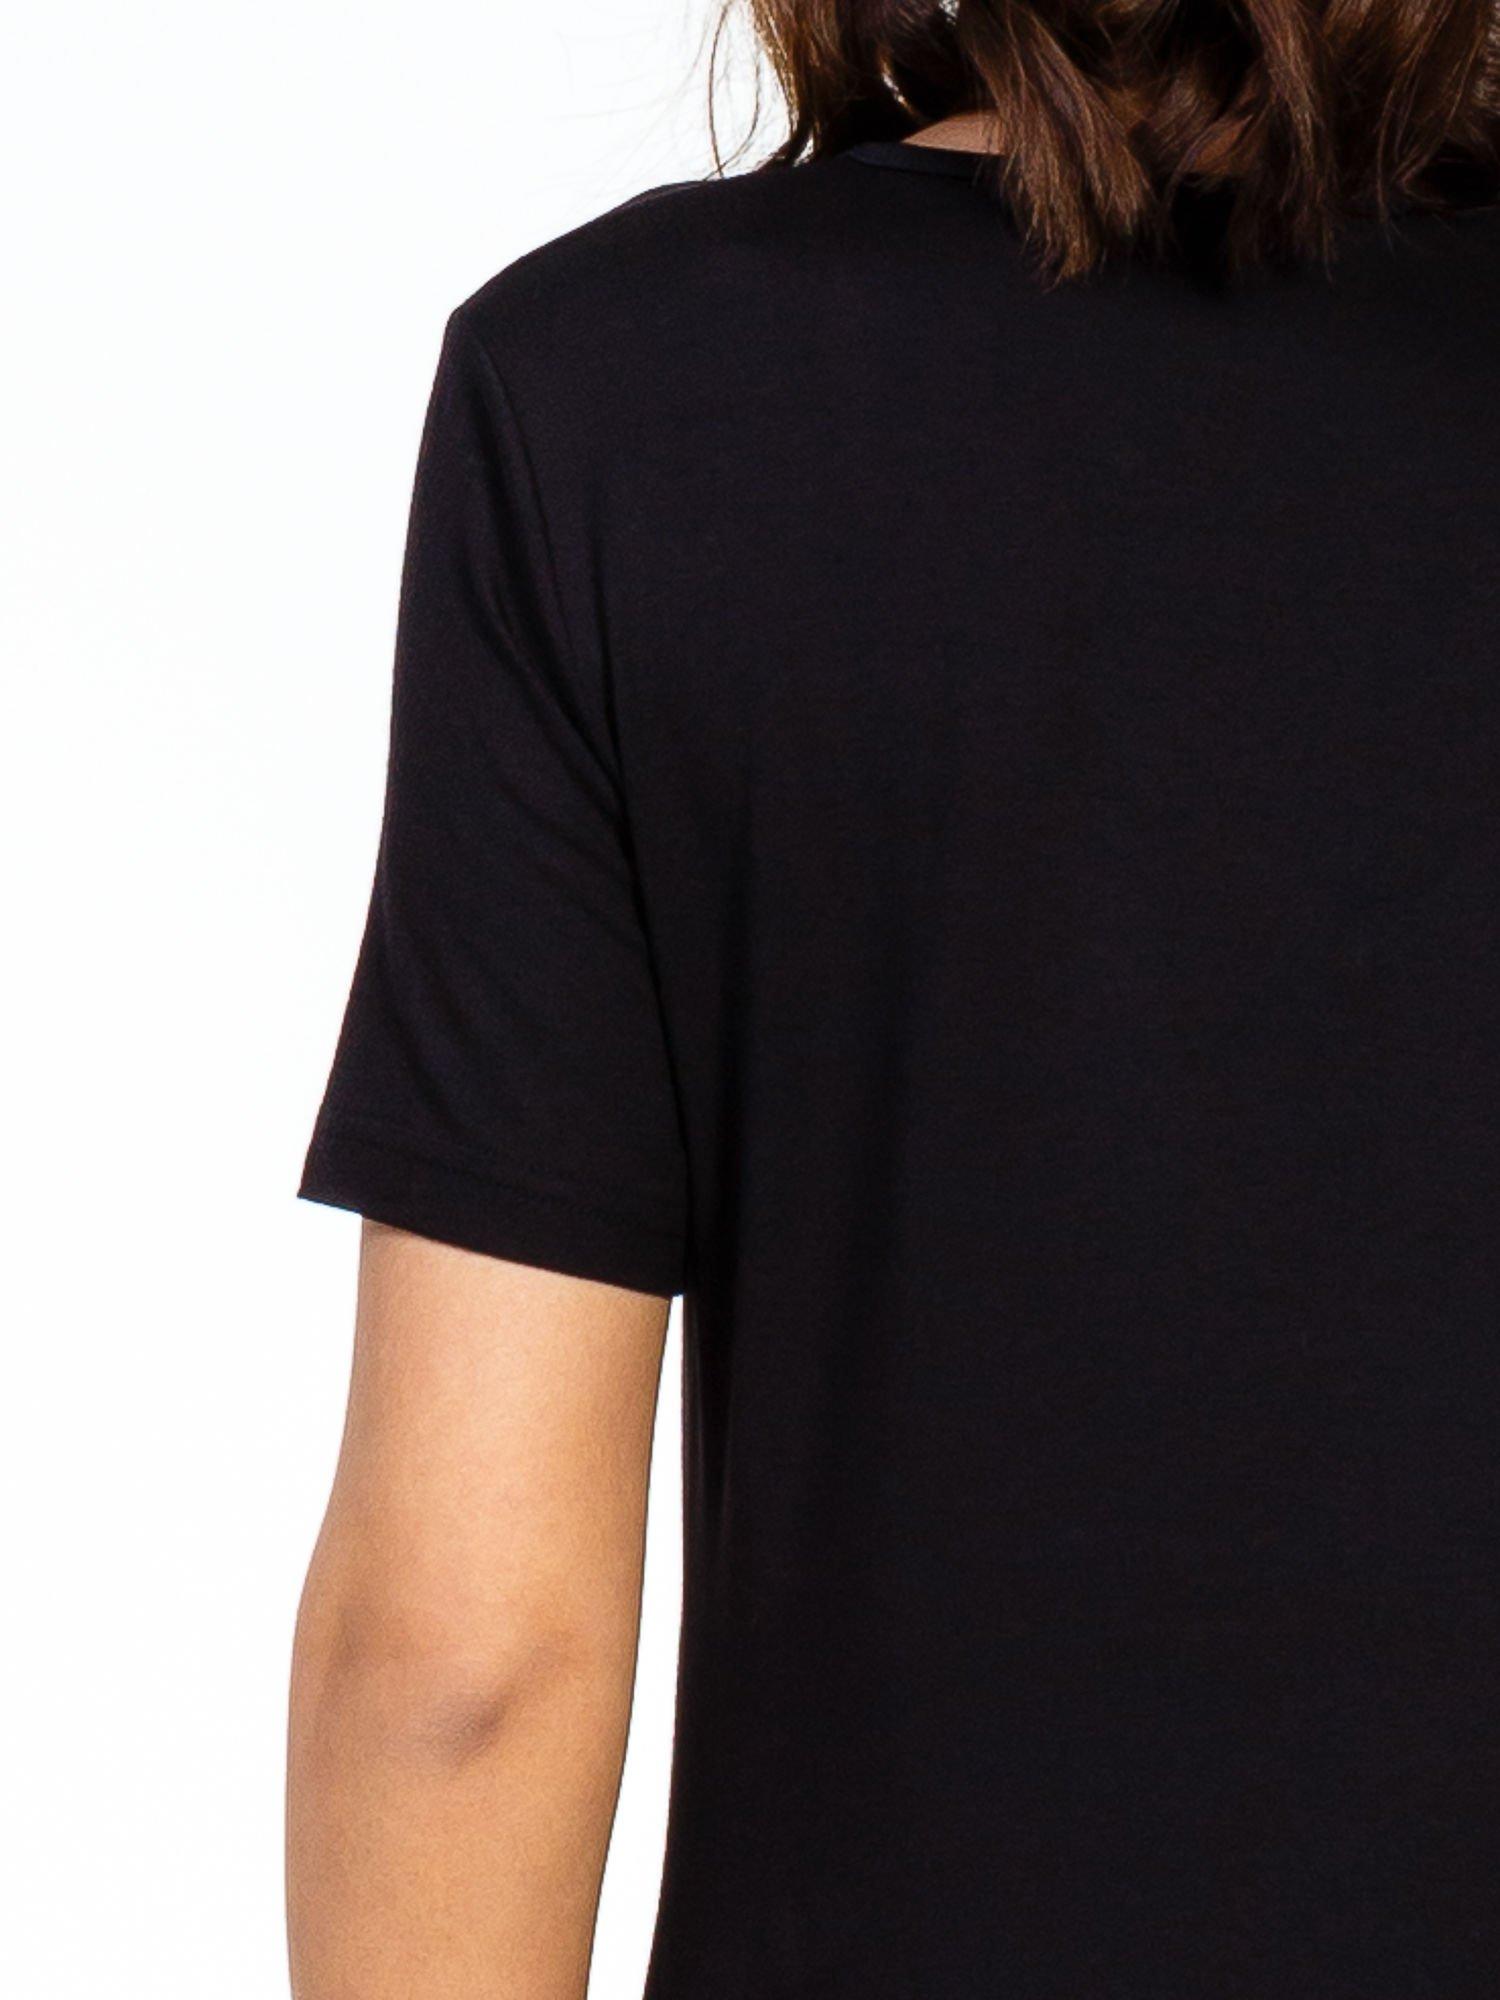 Czarna luźna sukienka z asymetrycznym dołem                                  zdj.                                  7